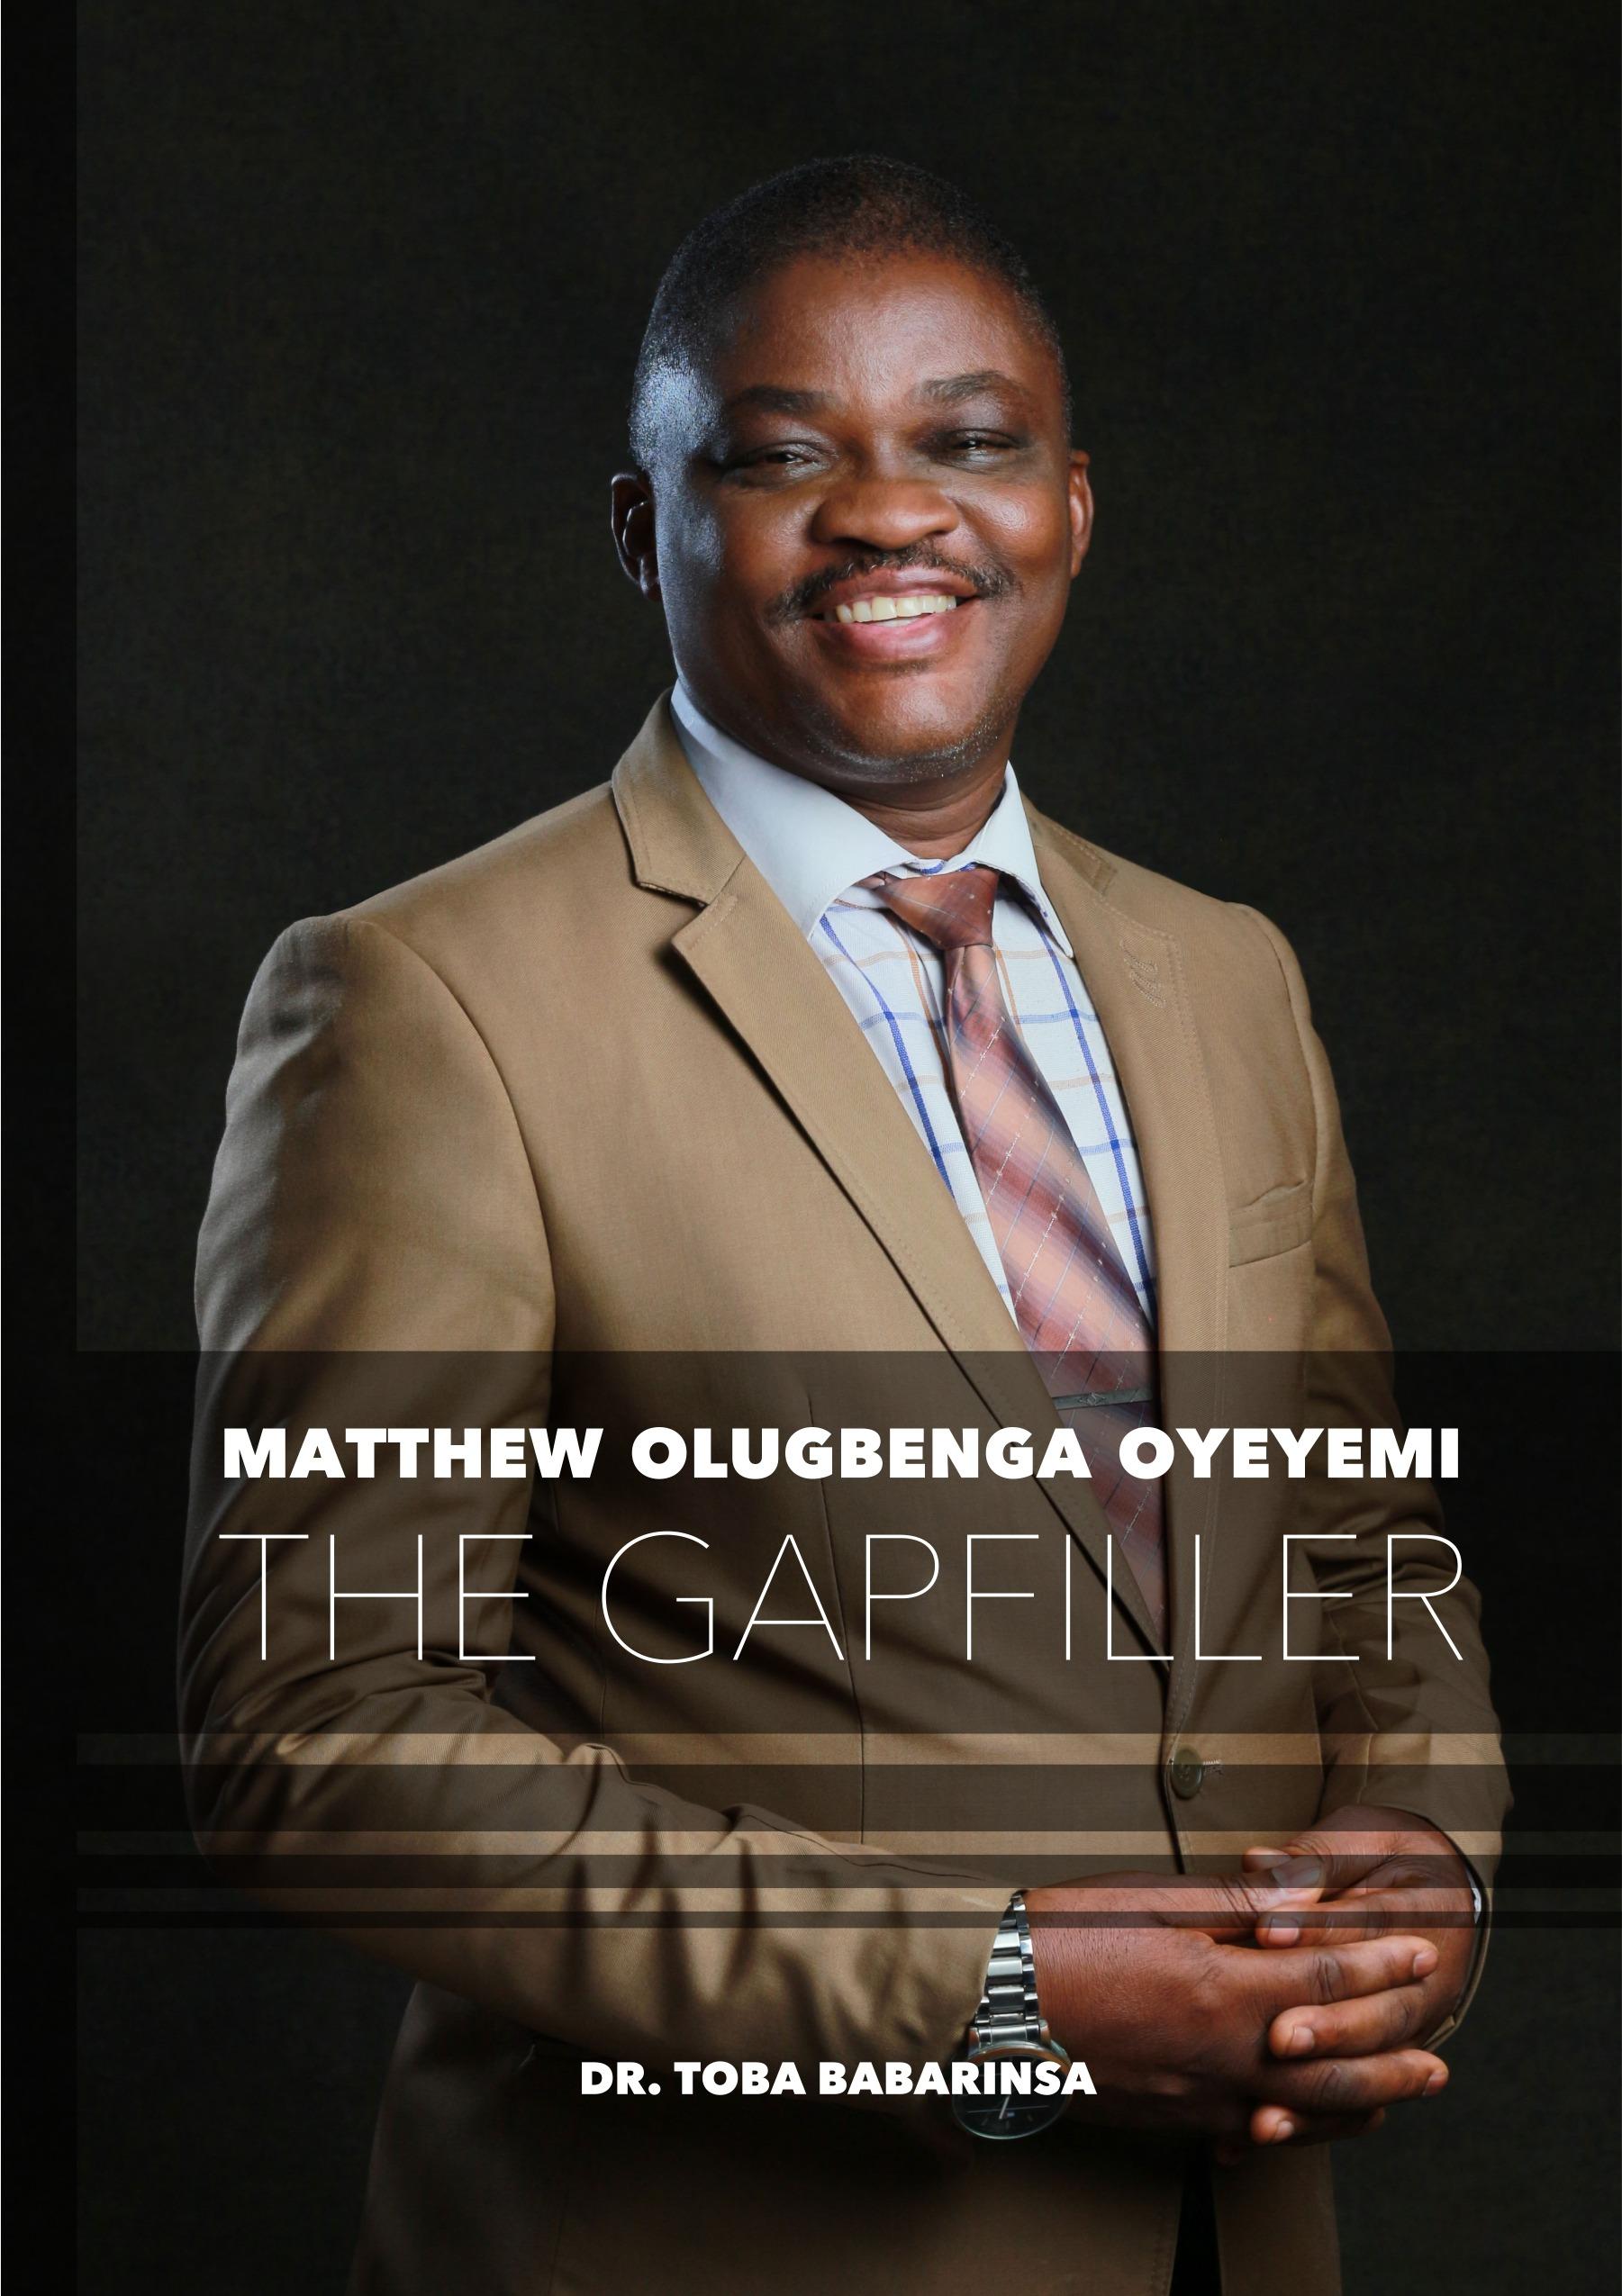 THE GAPFILLER